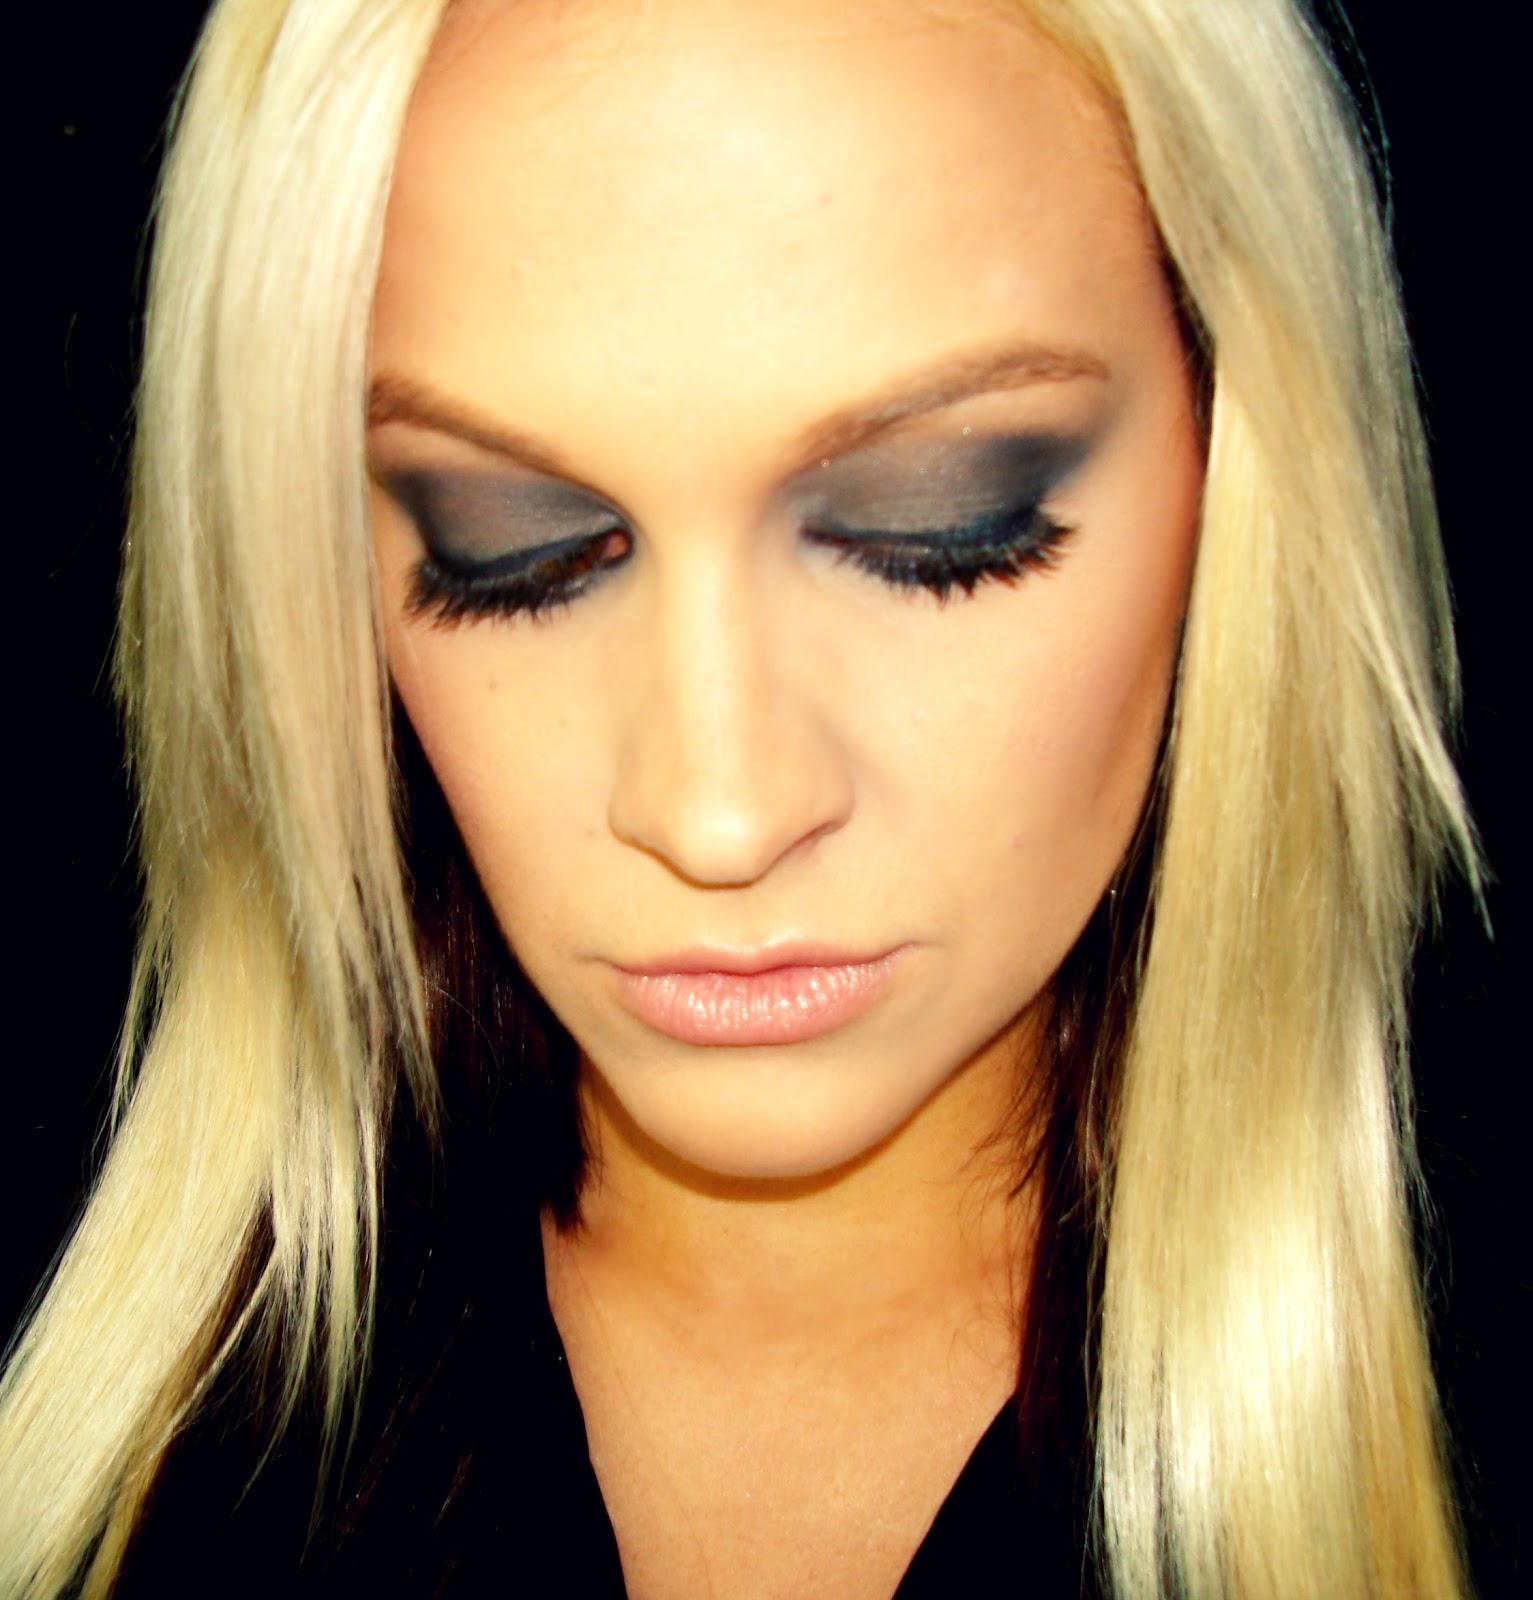 Bridal makeup Eye lash extensions | 98, Penteado casamento, Cabelo e maquilhagem